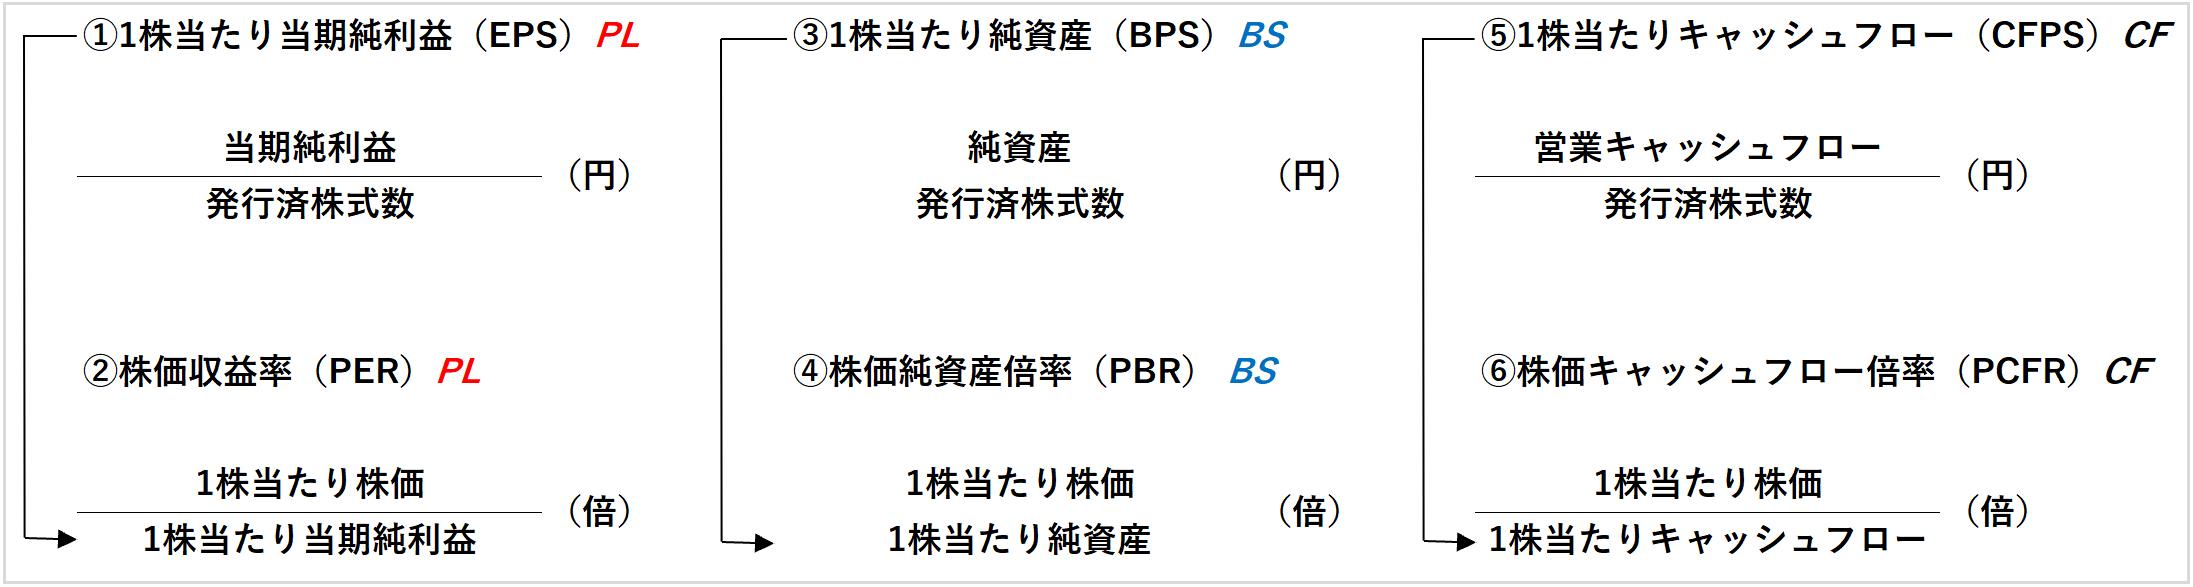 EPS PER BPS PBR CFPS PCFRの関係図(PC)